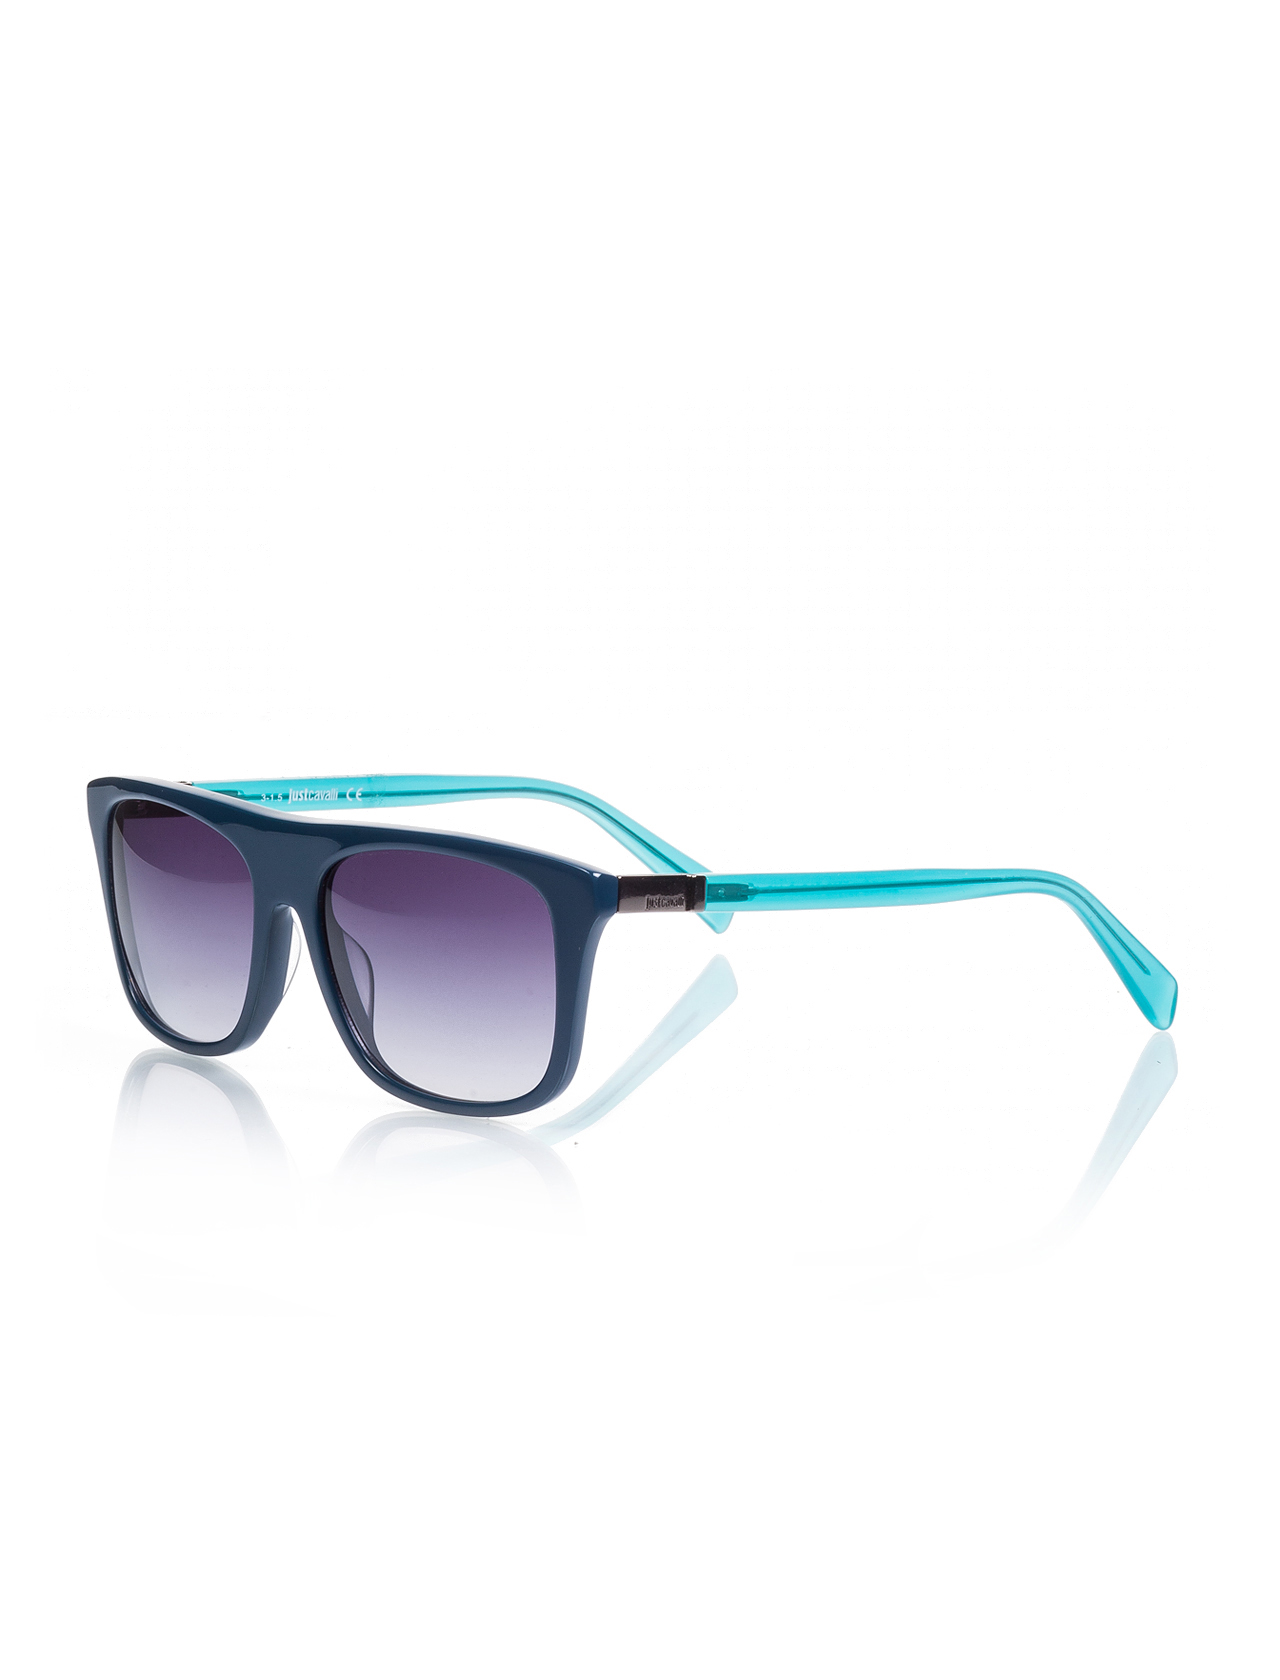 Unisex sunglasses jc 729 90b bone oil green organic square square 56-17-145 just cavalli